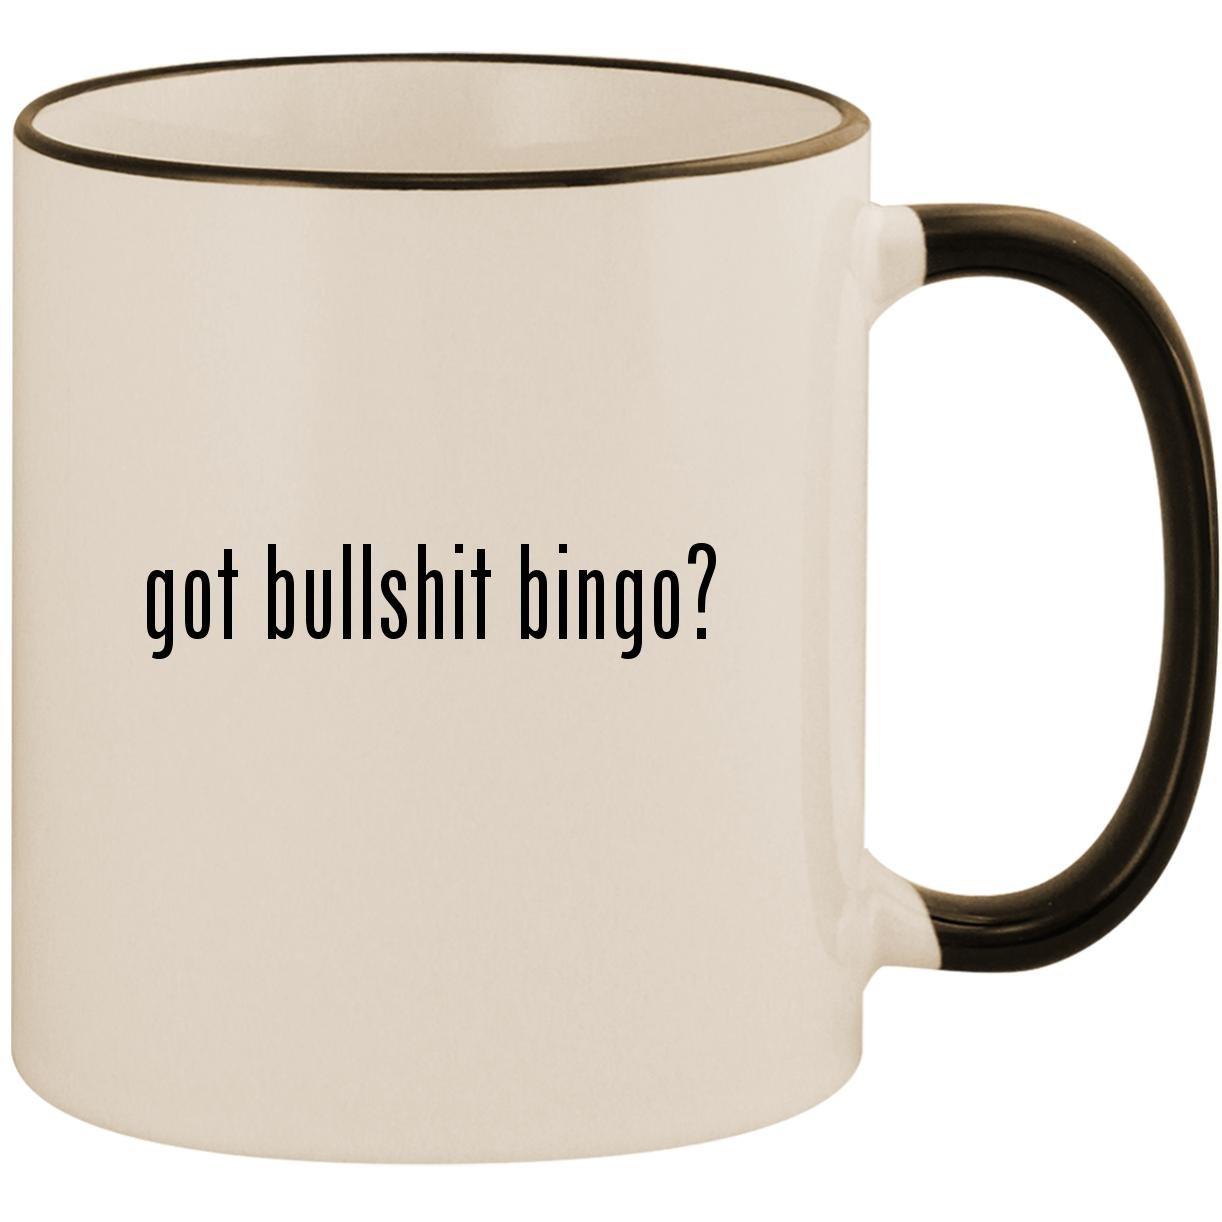 got bullshit bingo? - 11oz Ceramic Colored Handle & Rim Coffee Mug Cup, Black